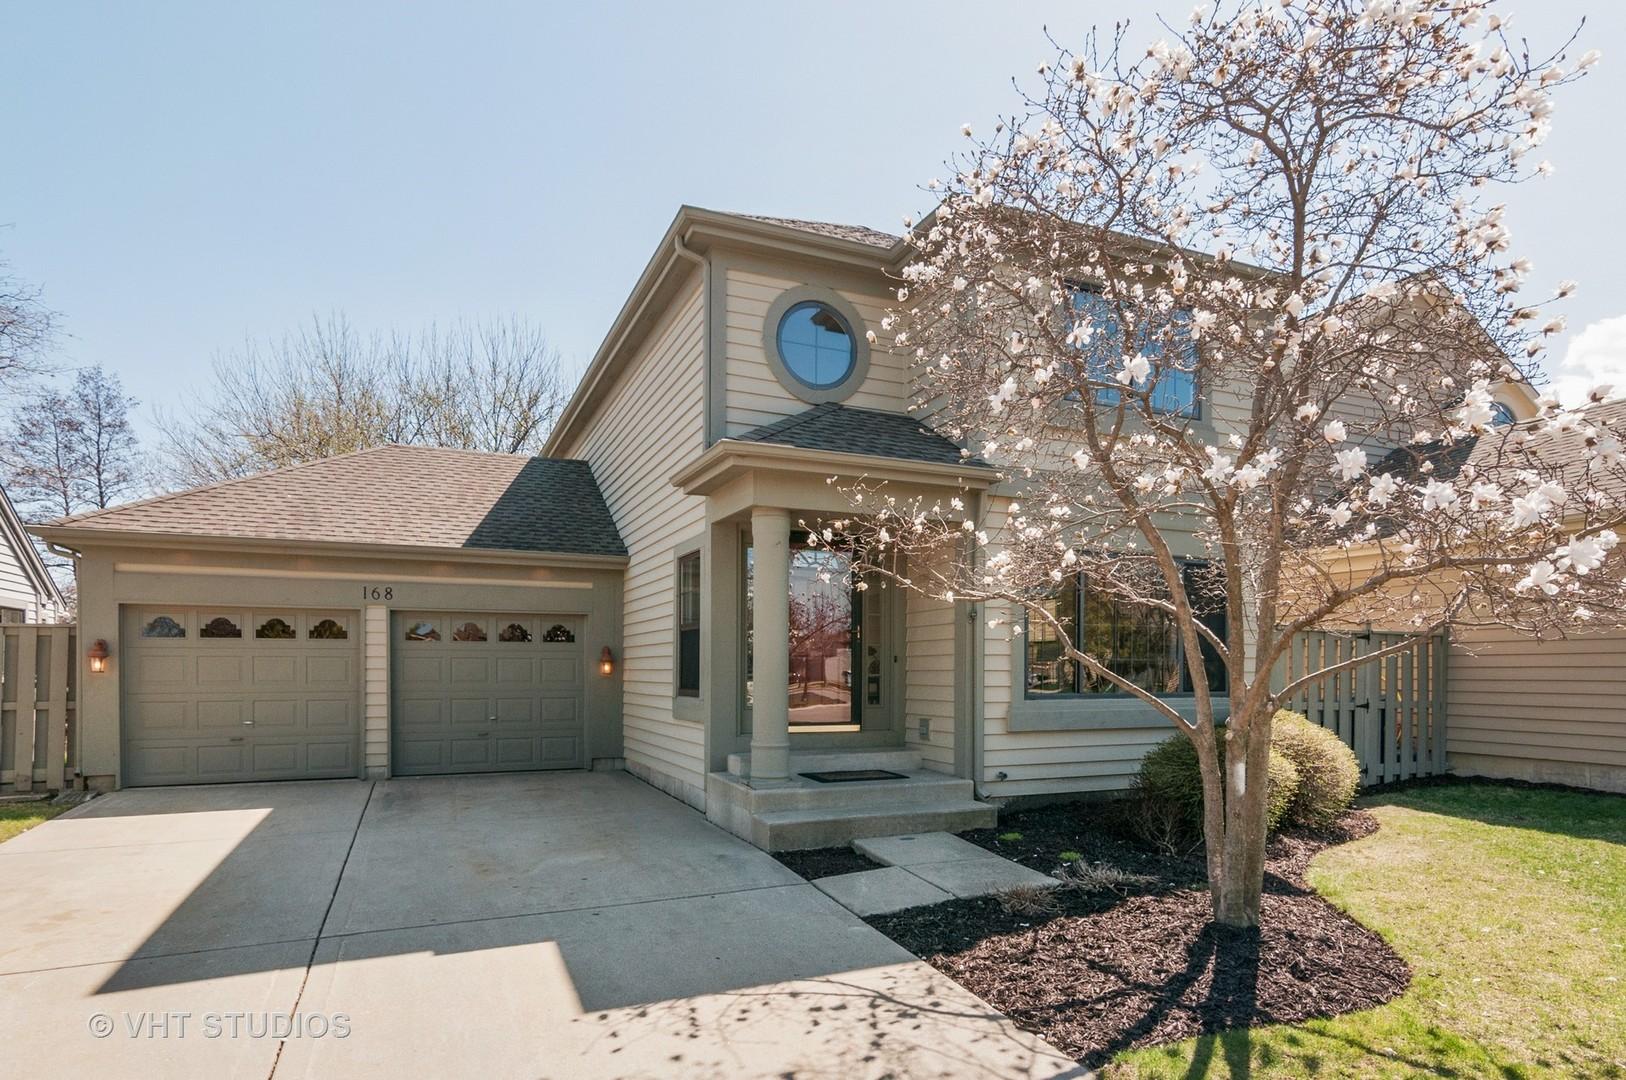 3 Bedroom Homes For Sale In Bloomingdale Illinois